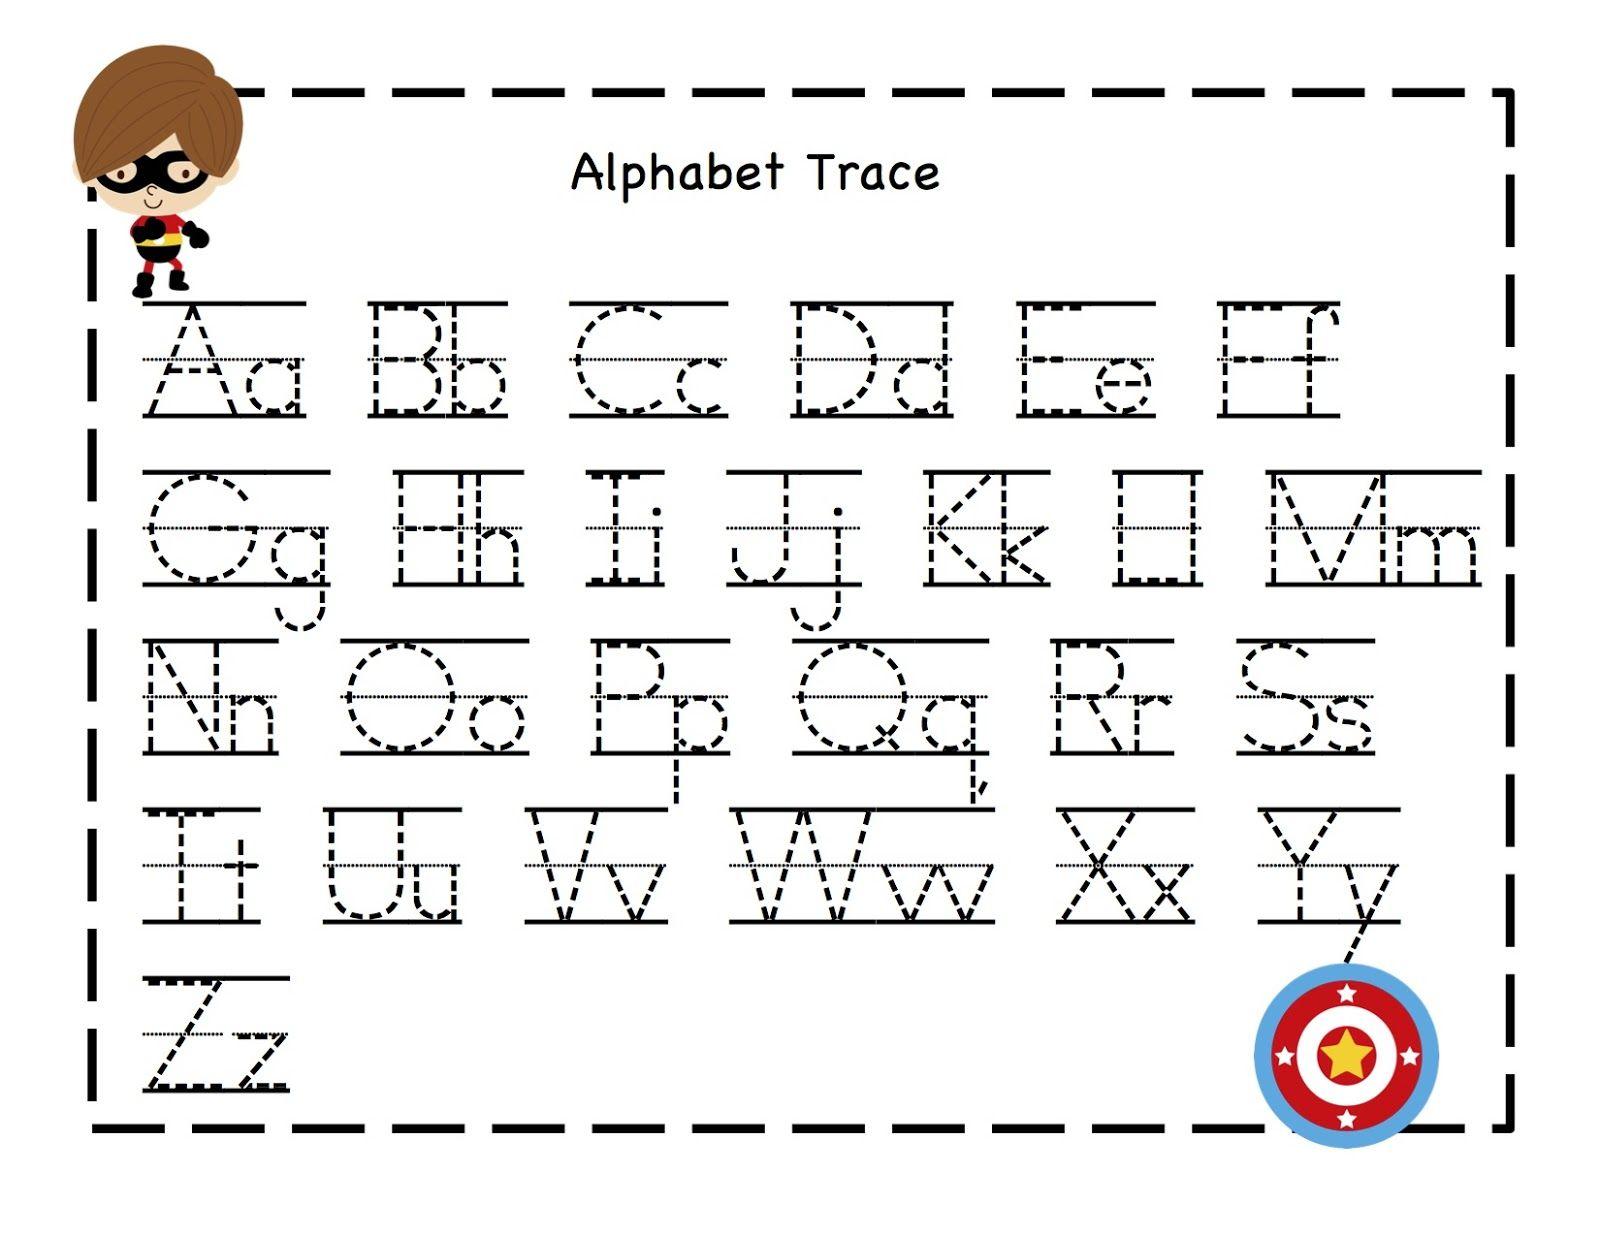 Super Hero Abc Tracing Sheets 1 | Alphabet Tracing intended for Alphabet Tracing Sheet Free